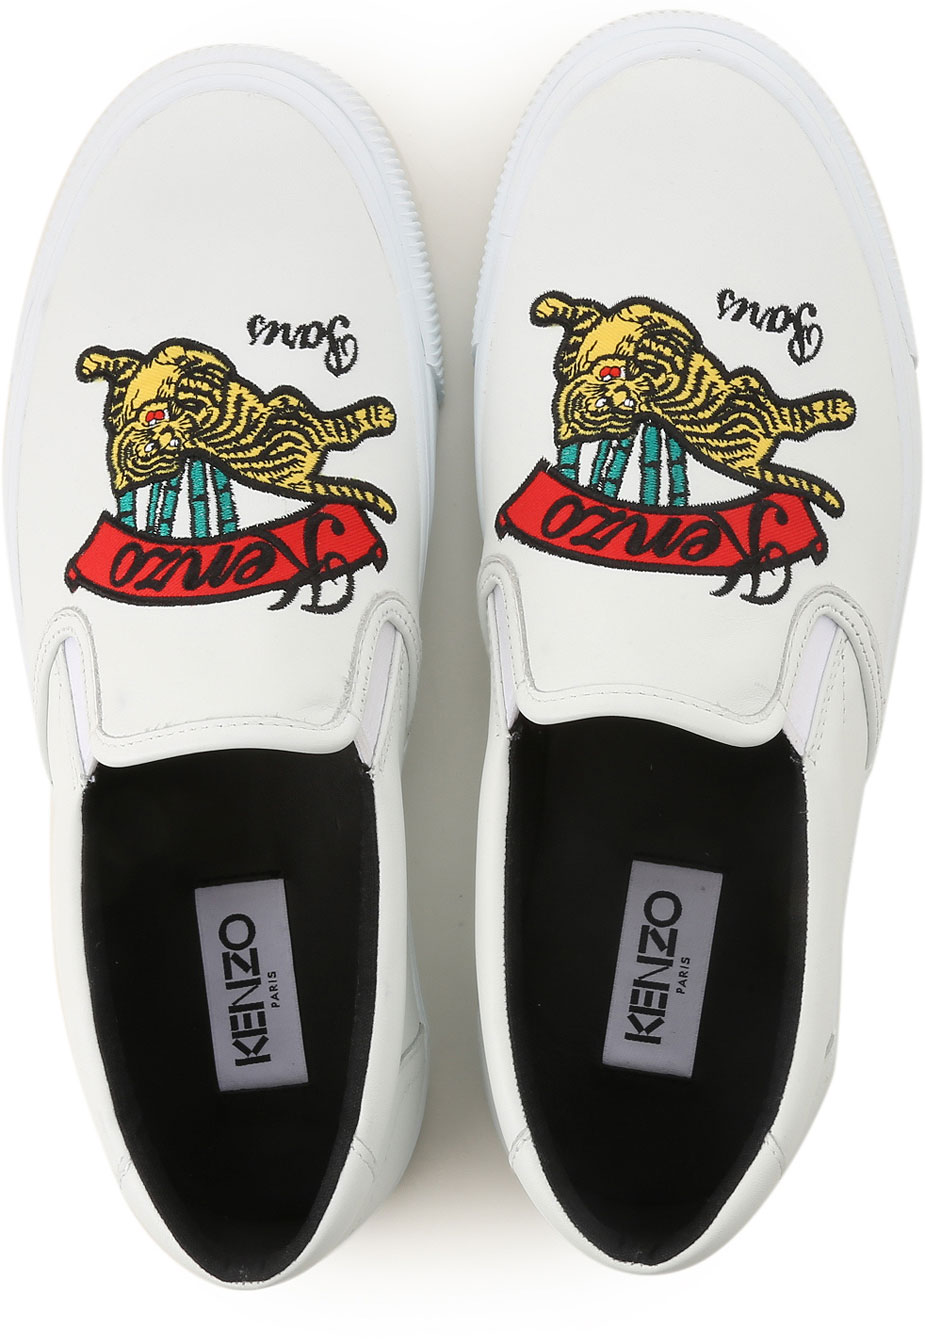 L50 Kenzo Chaussures Homme Zz7qwzd 01 Code 5sn104 Produit sohQxCtrdB